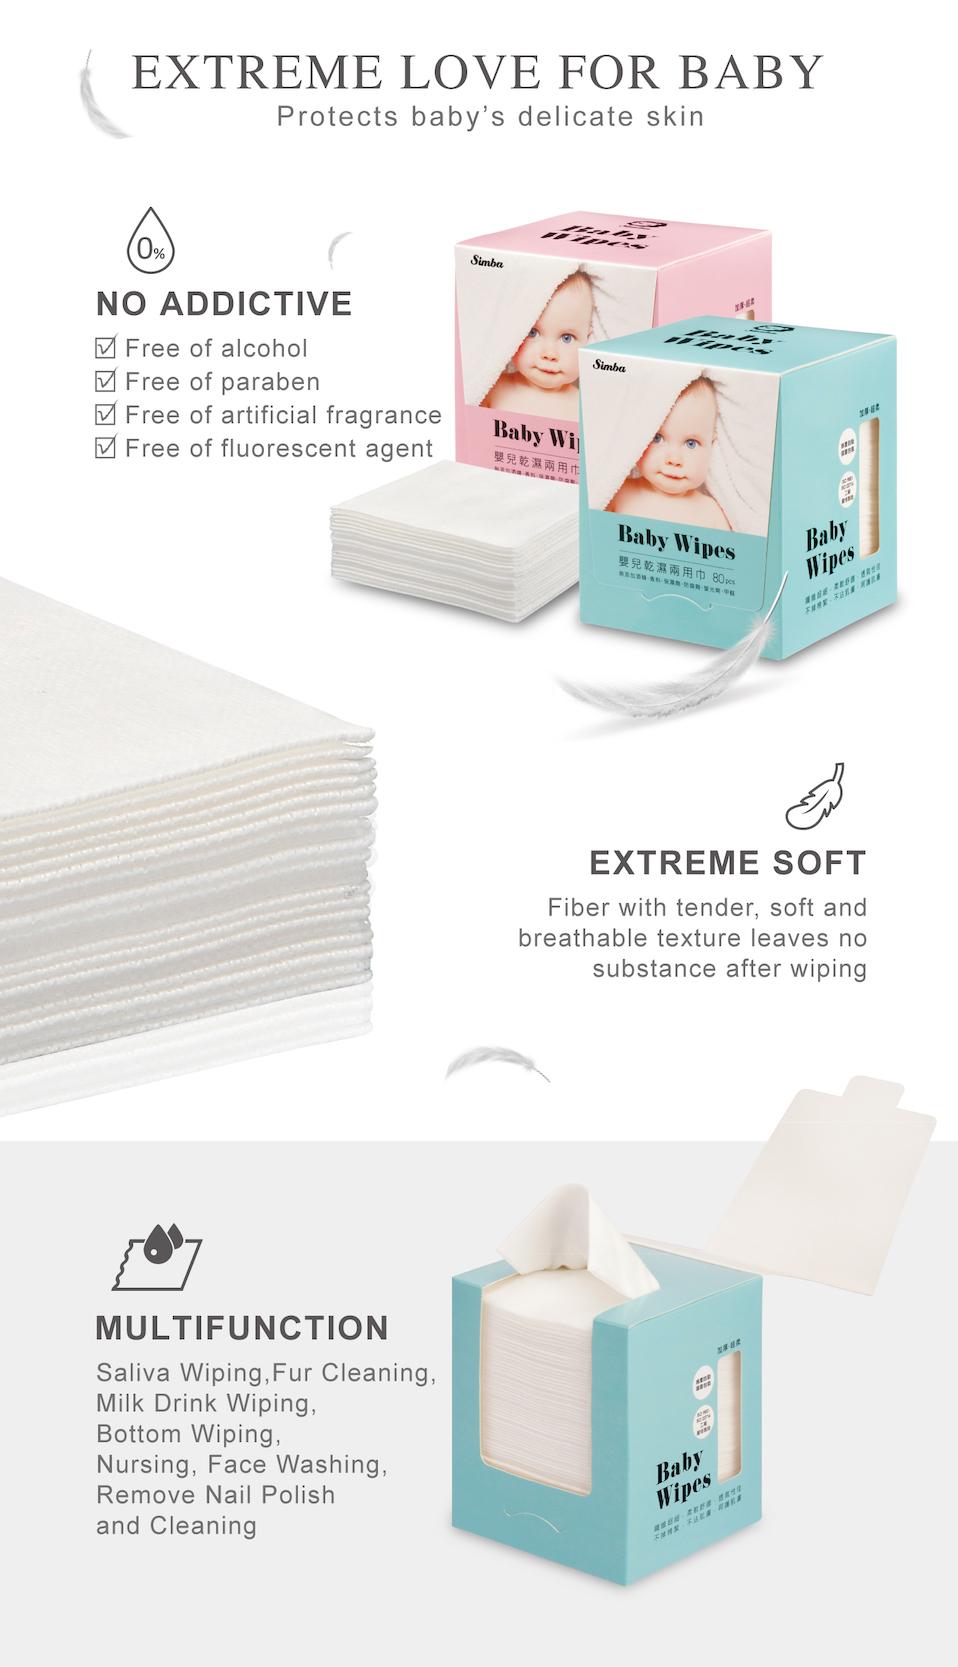 simba baby multi purpose dry and wet tissue wipes 宝宝干湿两用多用途湿巾